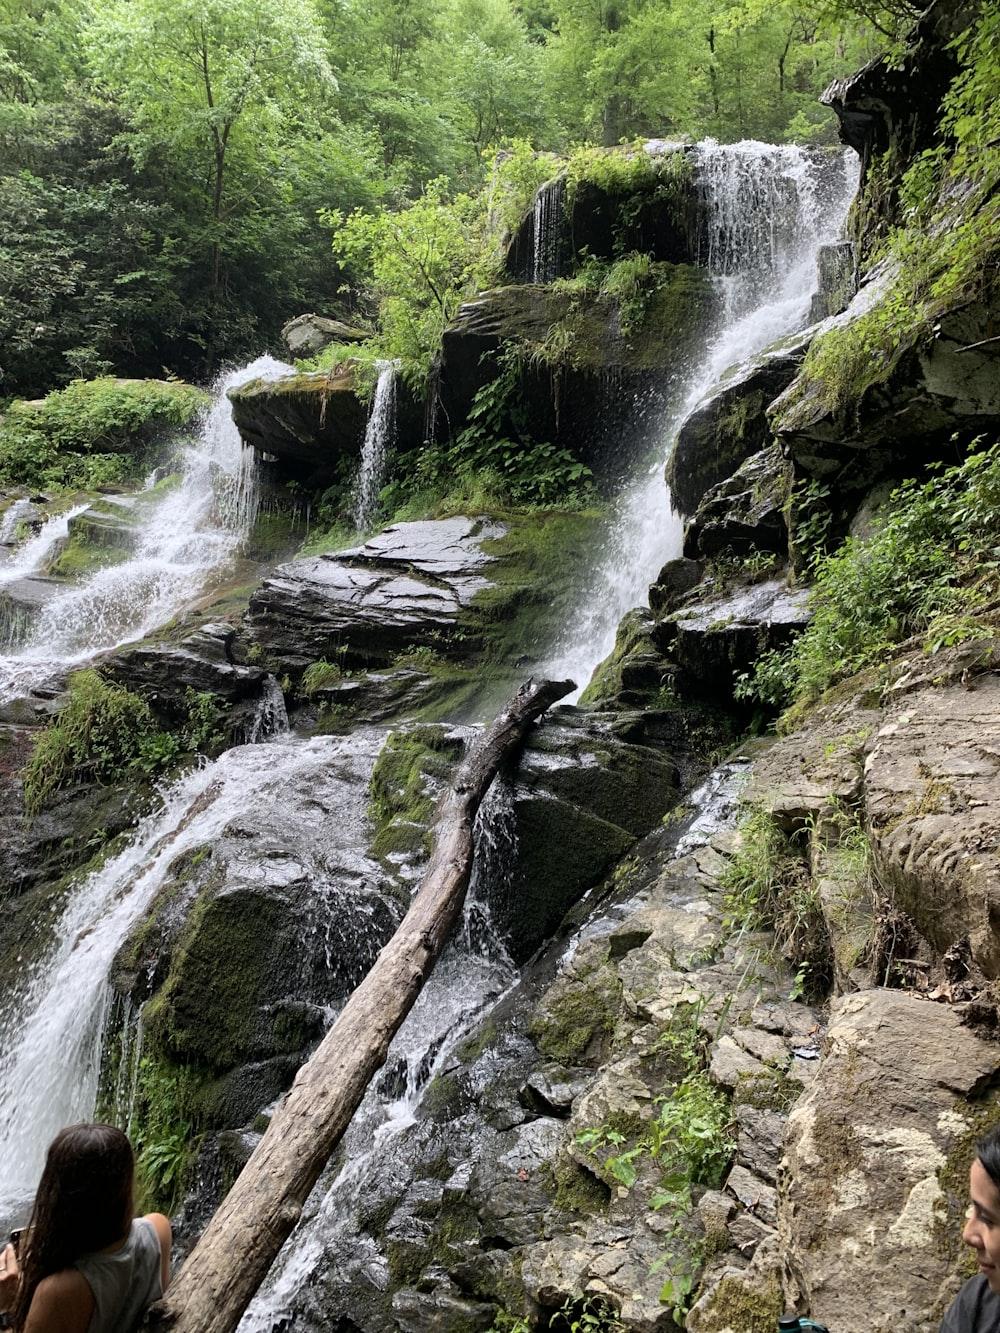 green trees beside waterfalls